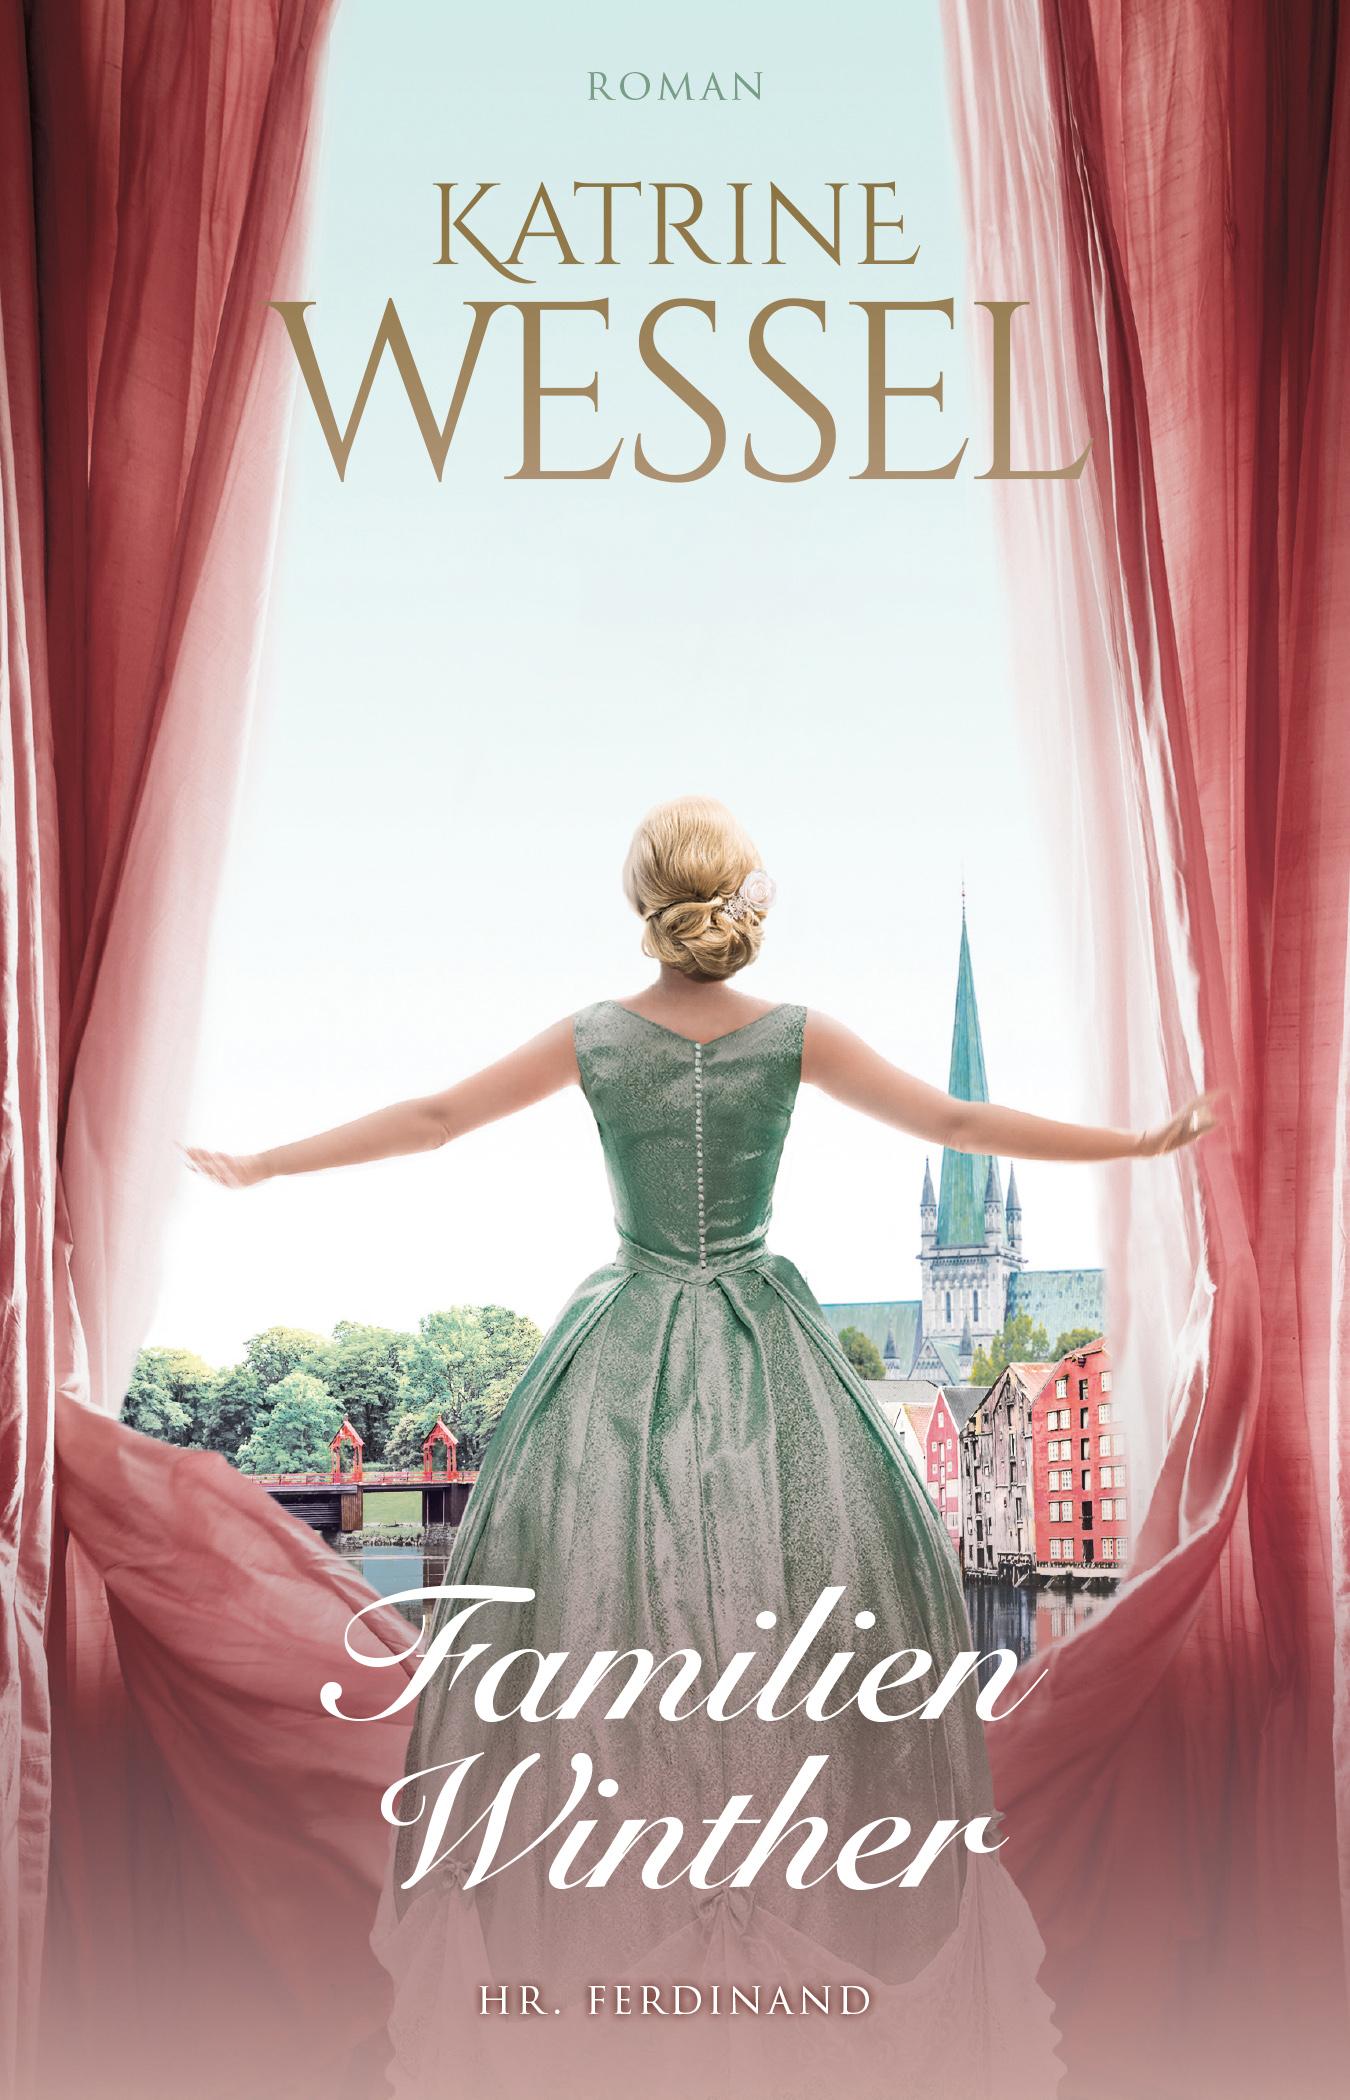 Familien Winther: Familien Winther - Katrine Wessel - Bøger - Hr. Ferdinand - 9788740063325 - 14/1-2021